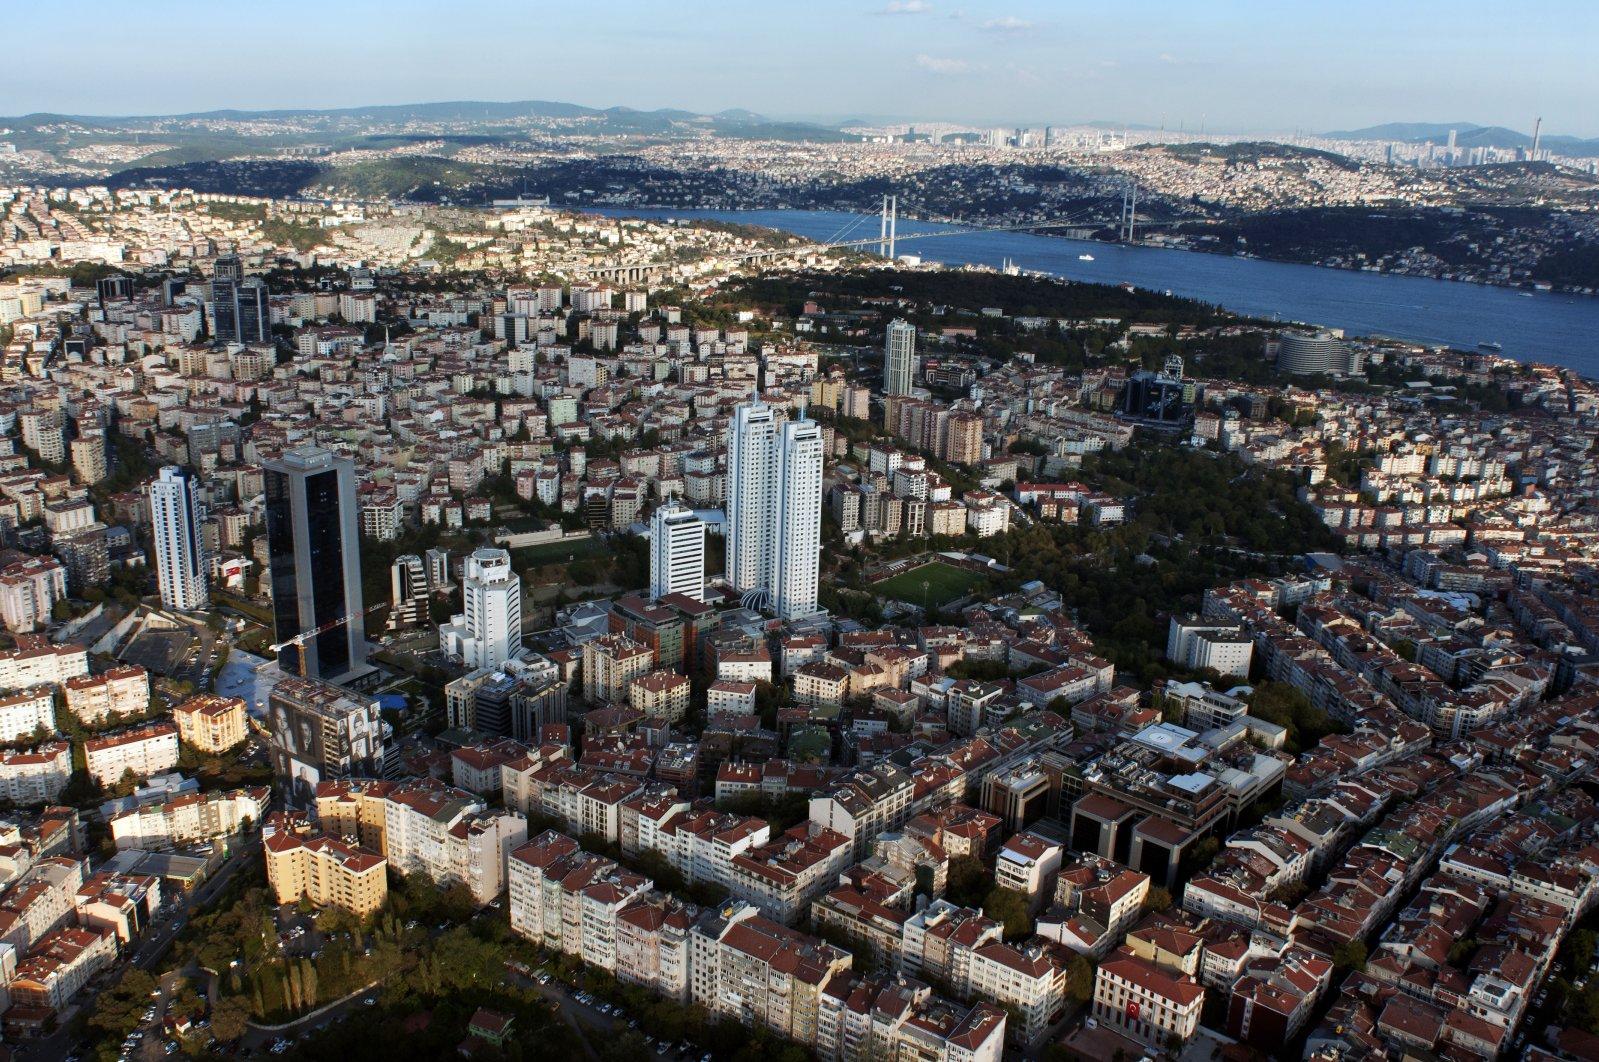 An aerial view of Turkey's metropolis, Istanbul, Sept. 22, 2017. (iStock Photo)